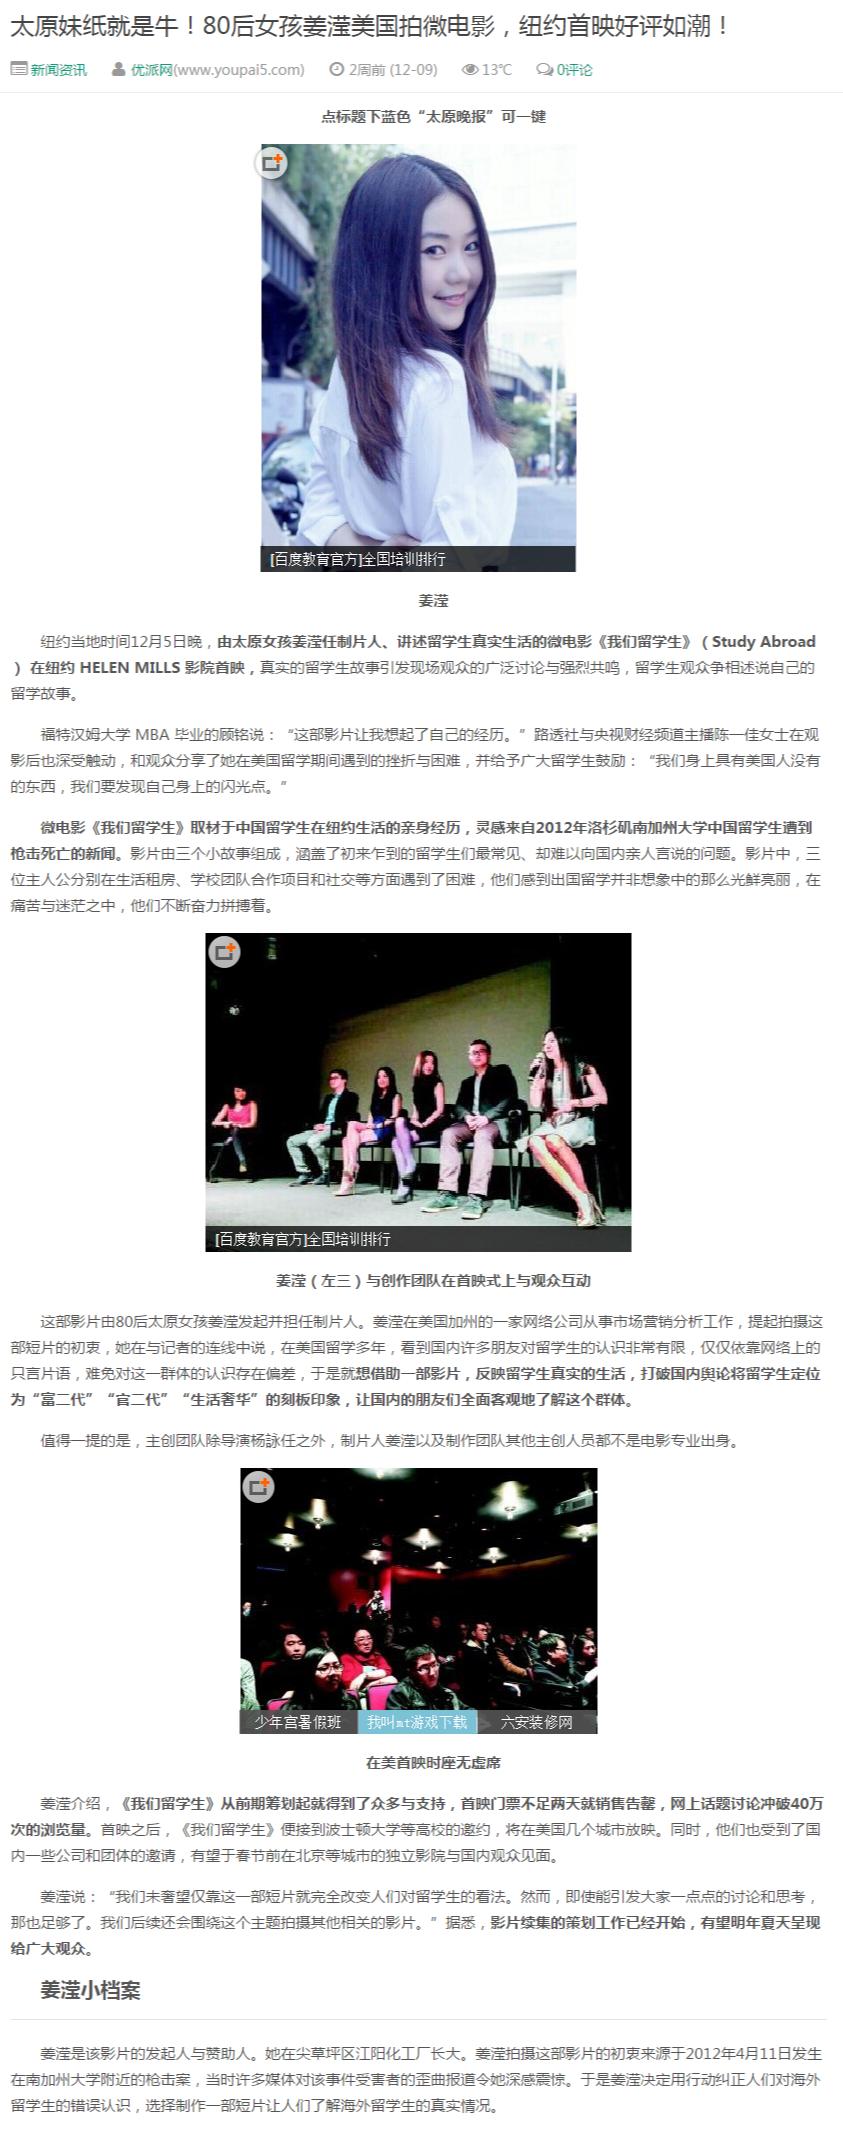 youpai5 12/9 report